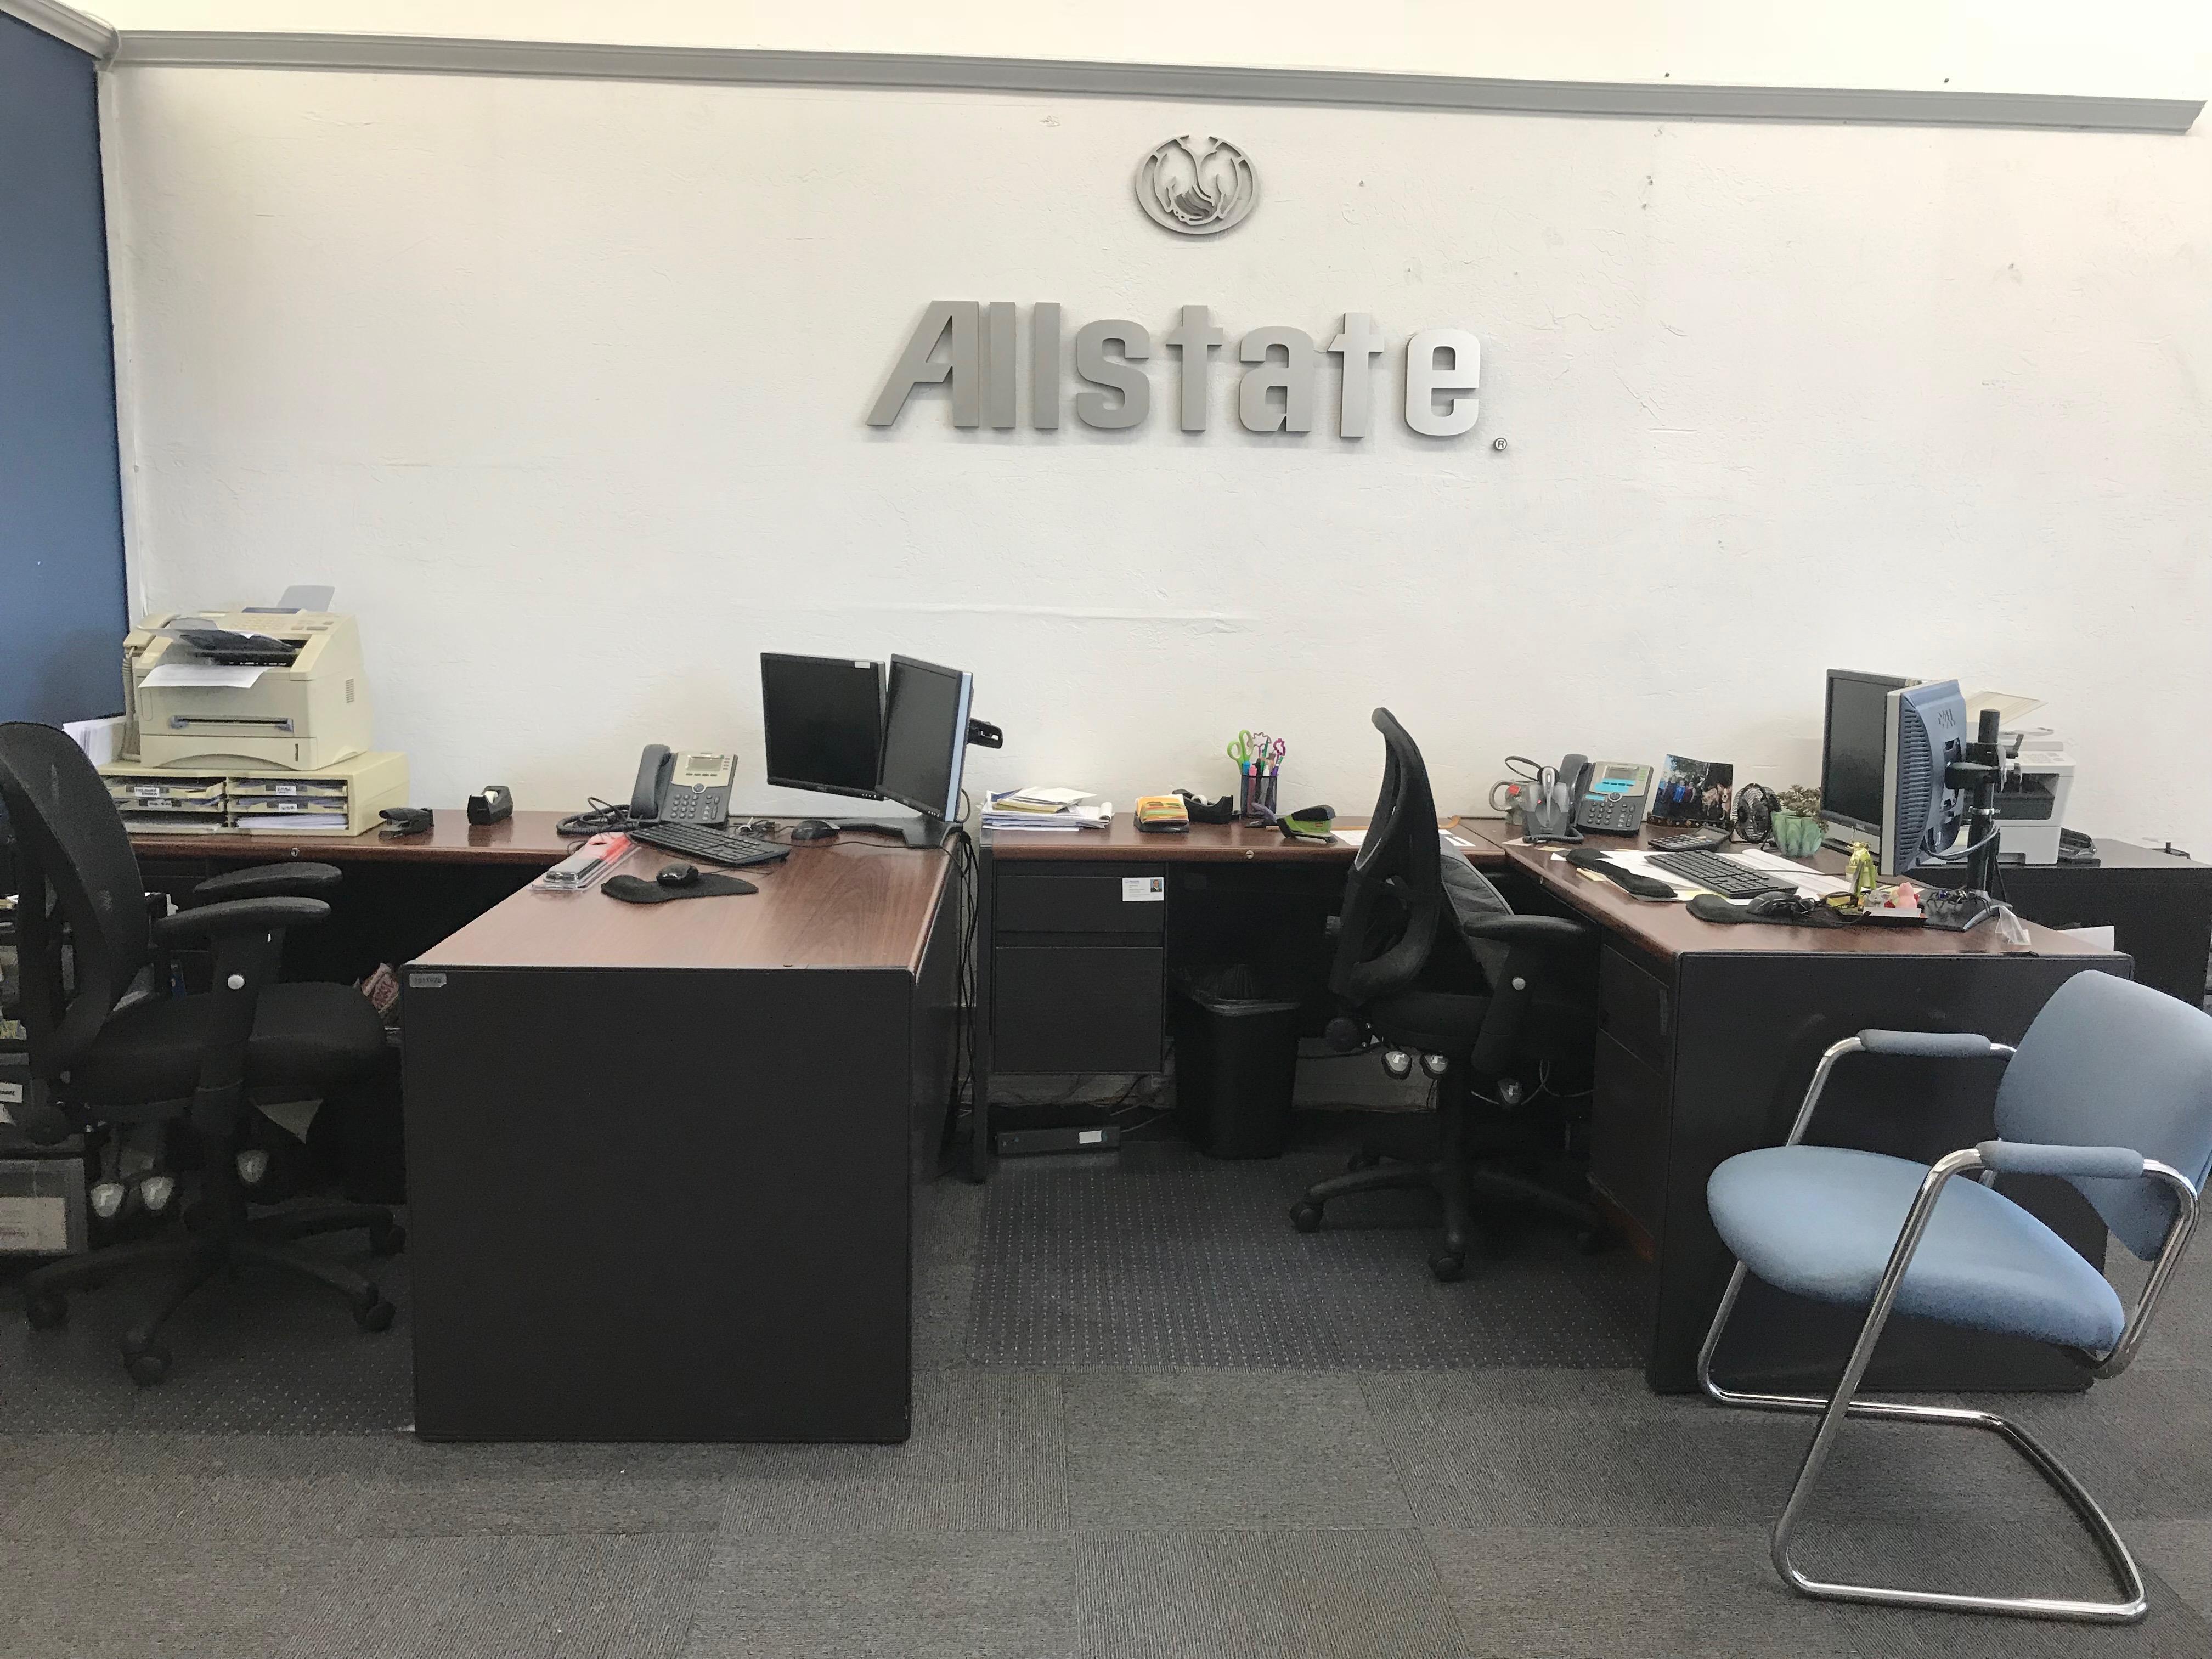 Timothy Carter: Allstate Insurance image 2